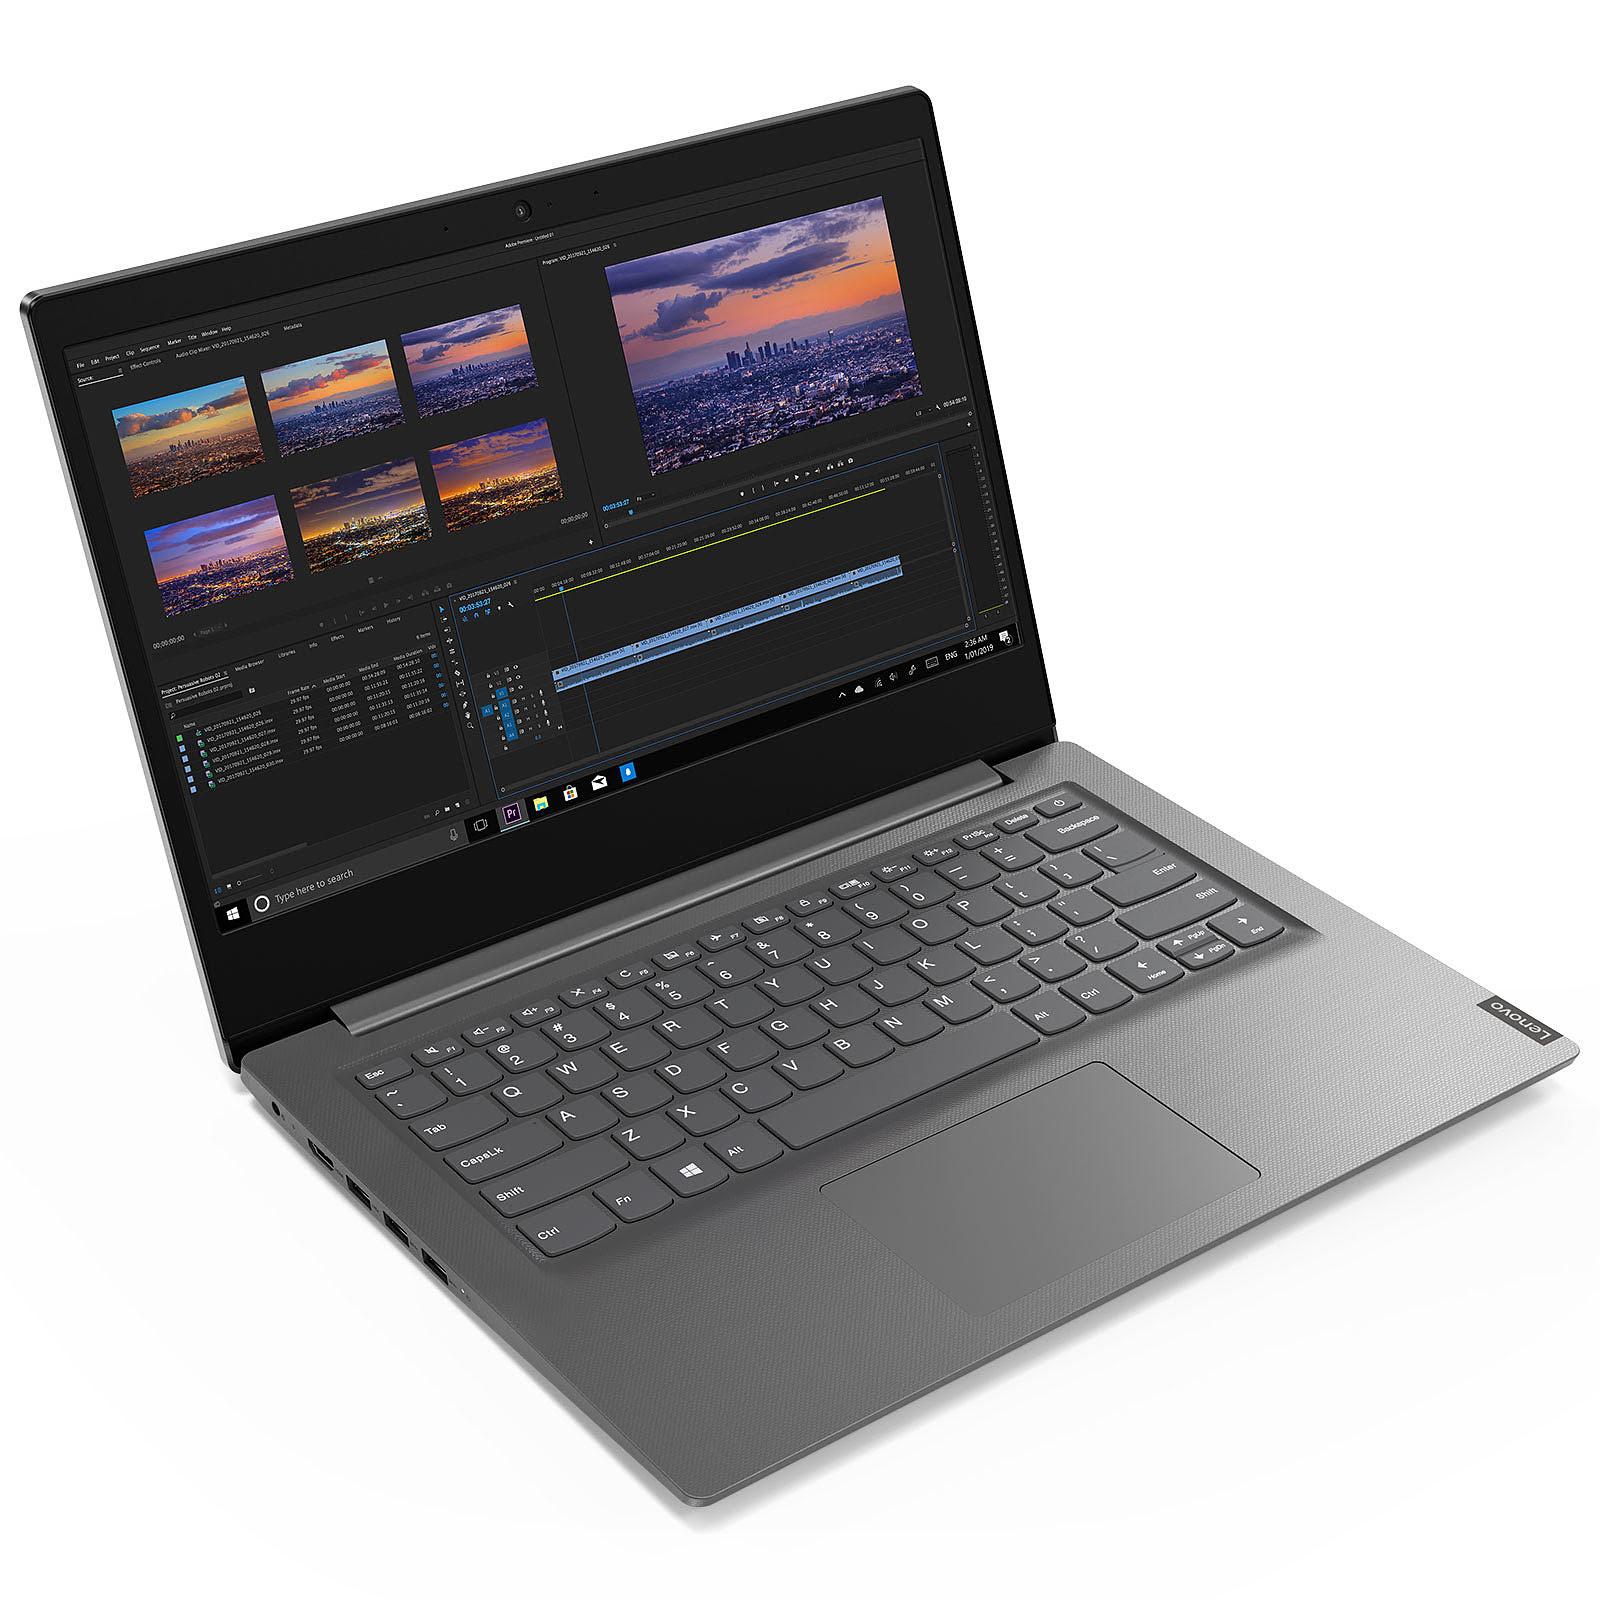 Lenovo 82C400SFFR - PC portable Lenovo - Cybertek.fr - 3